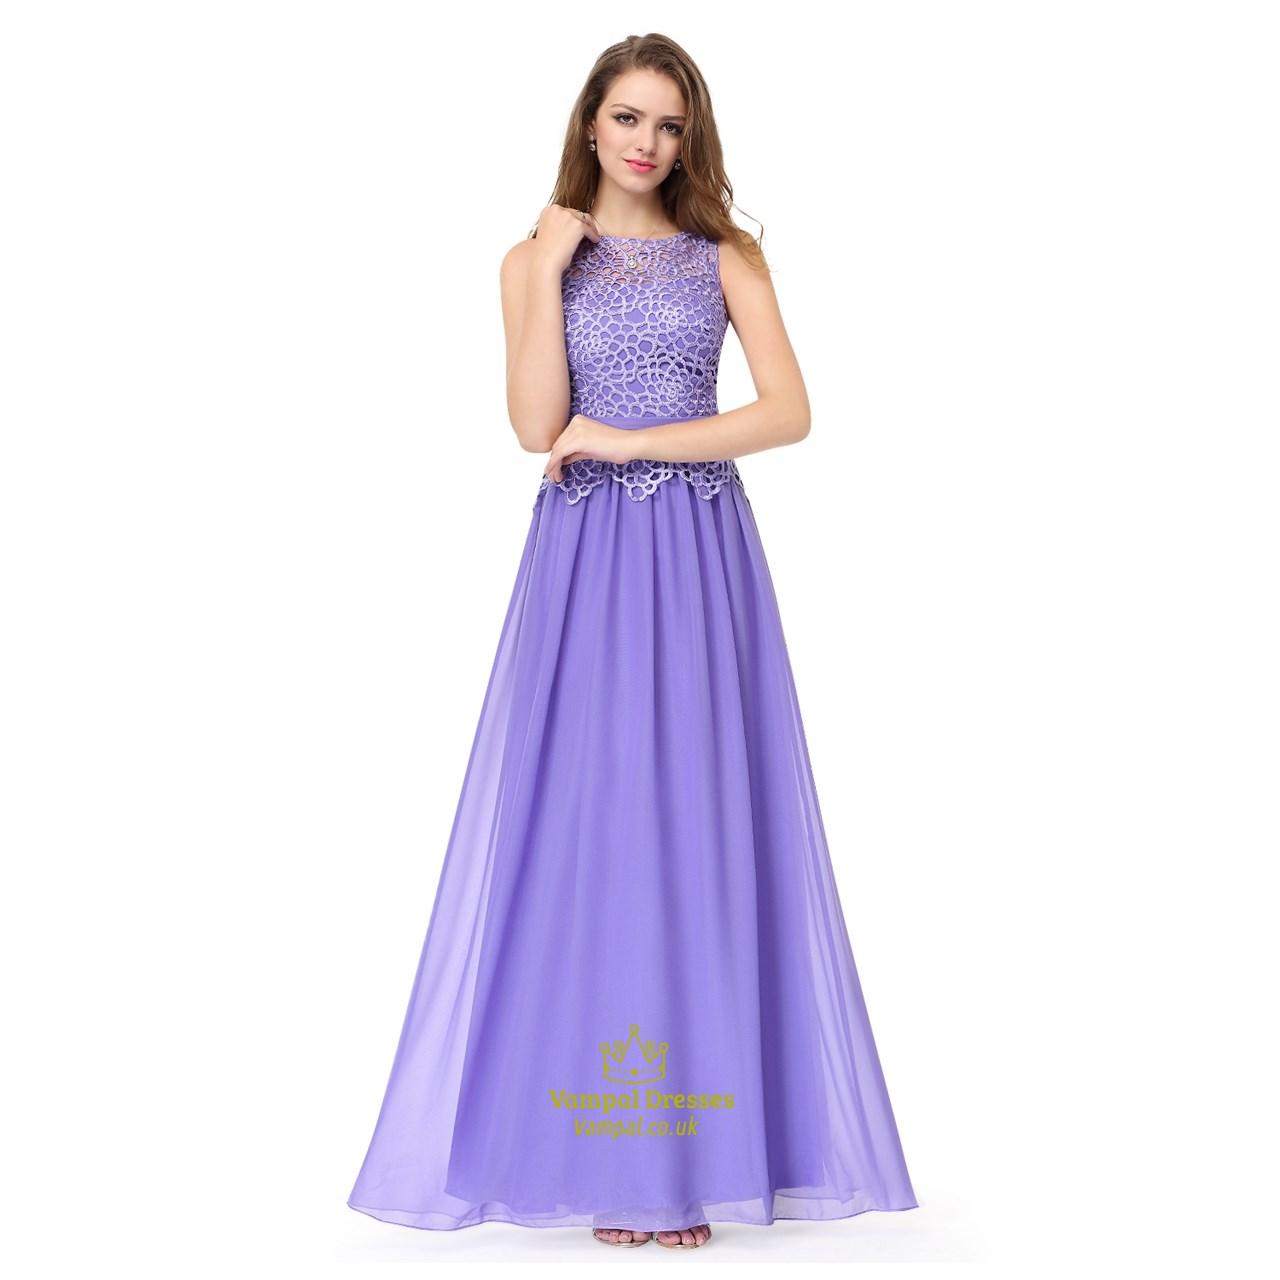 bffefb9ff3 Amethyst Lace Top Chiffon Bottom Sleeveless Illusion Bridesmaid Dress SKU  -AP077